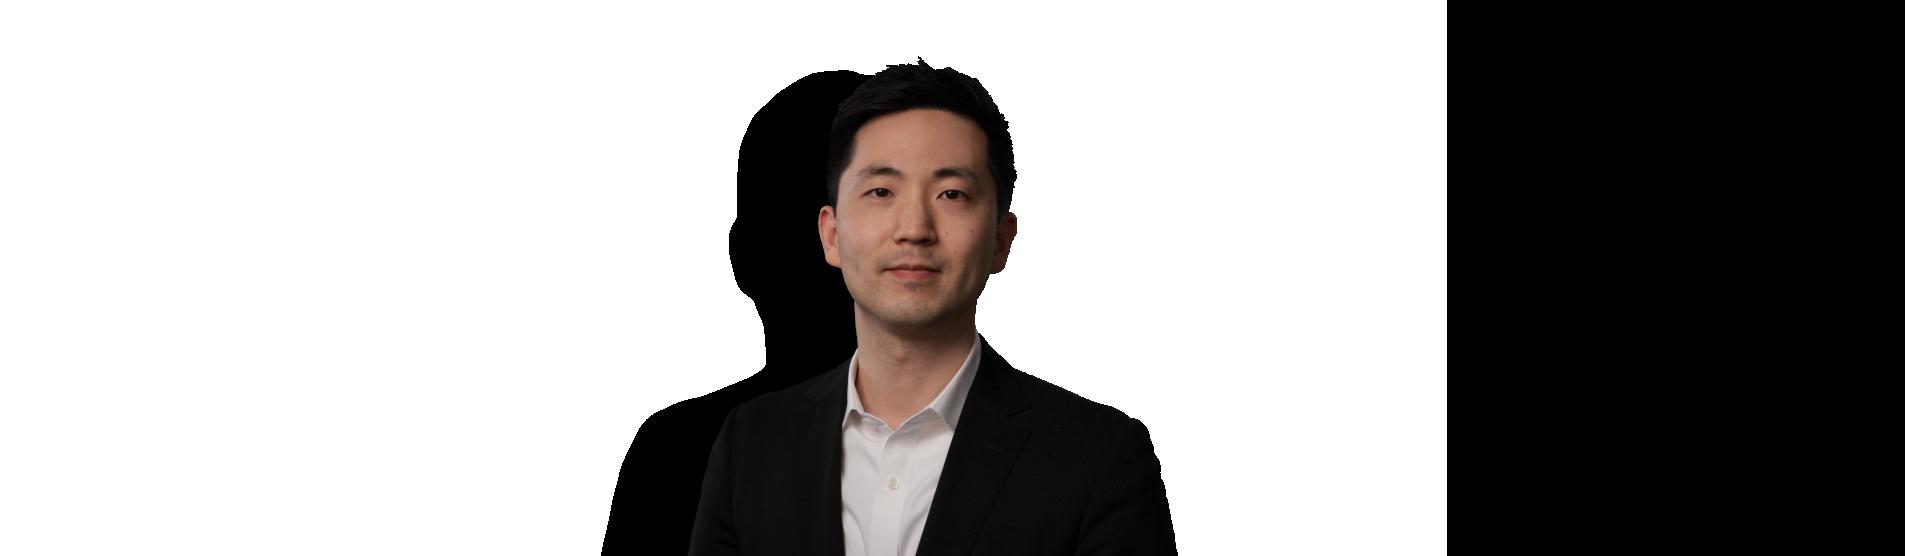 Headshot of Jacob Huh